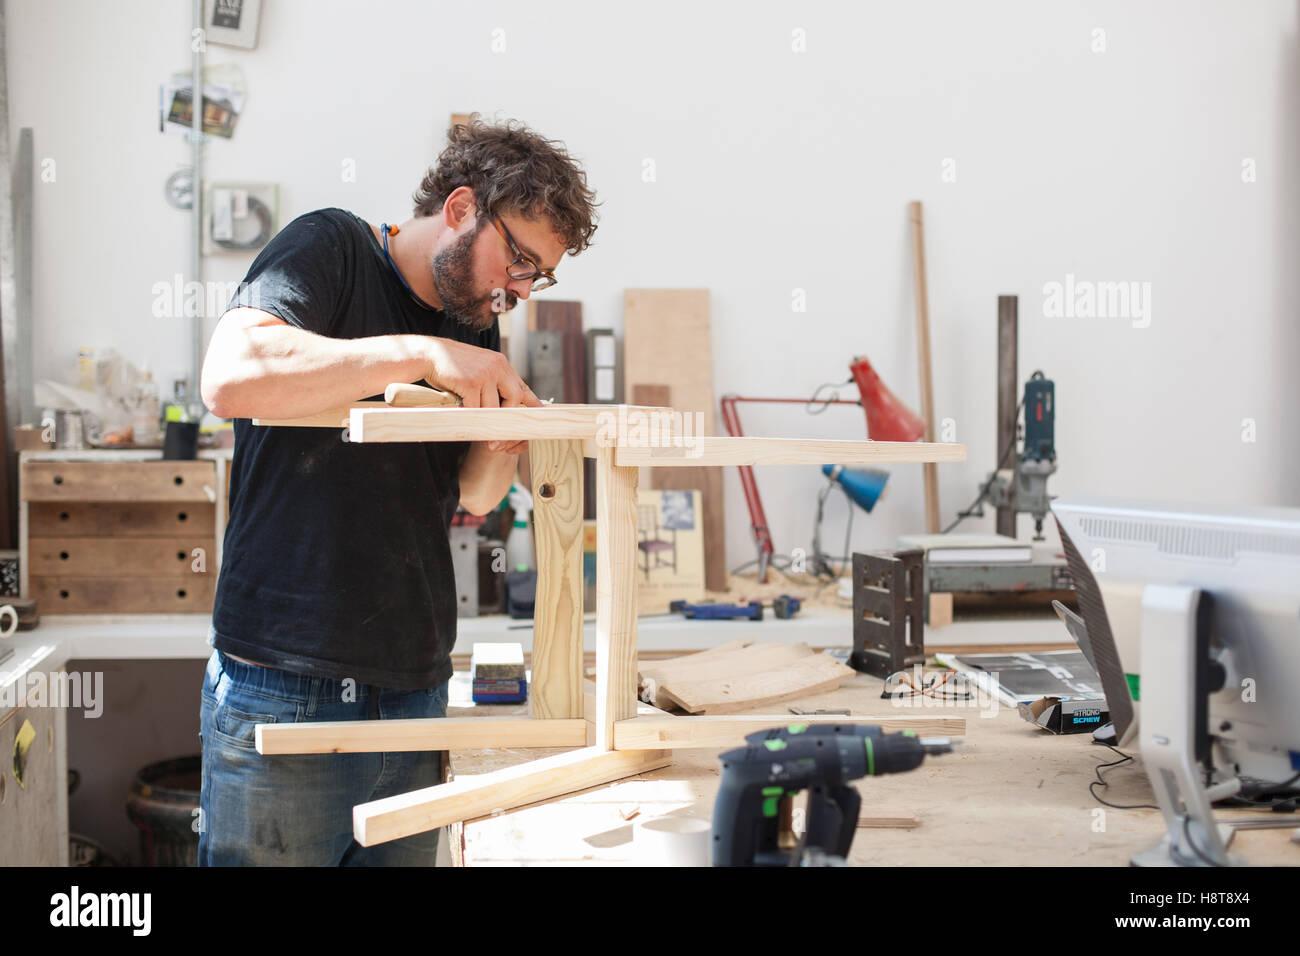 Bespoke Furniture Maker Stock Photos & Bespoke Furniture Maker ...